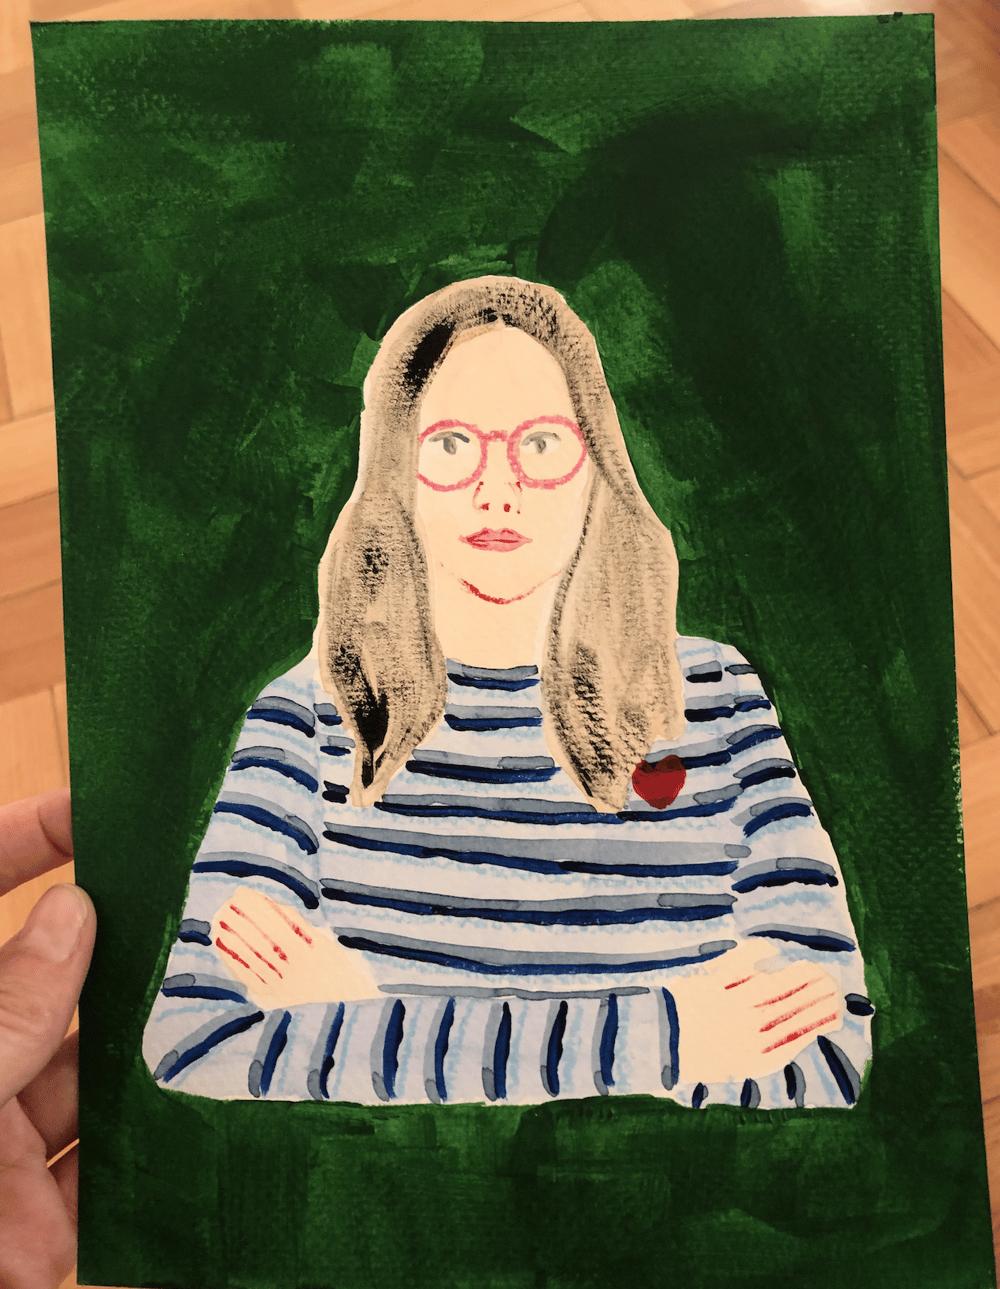 Self-Portrait - image 1 - student project